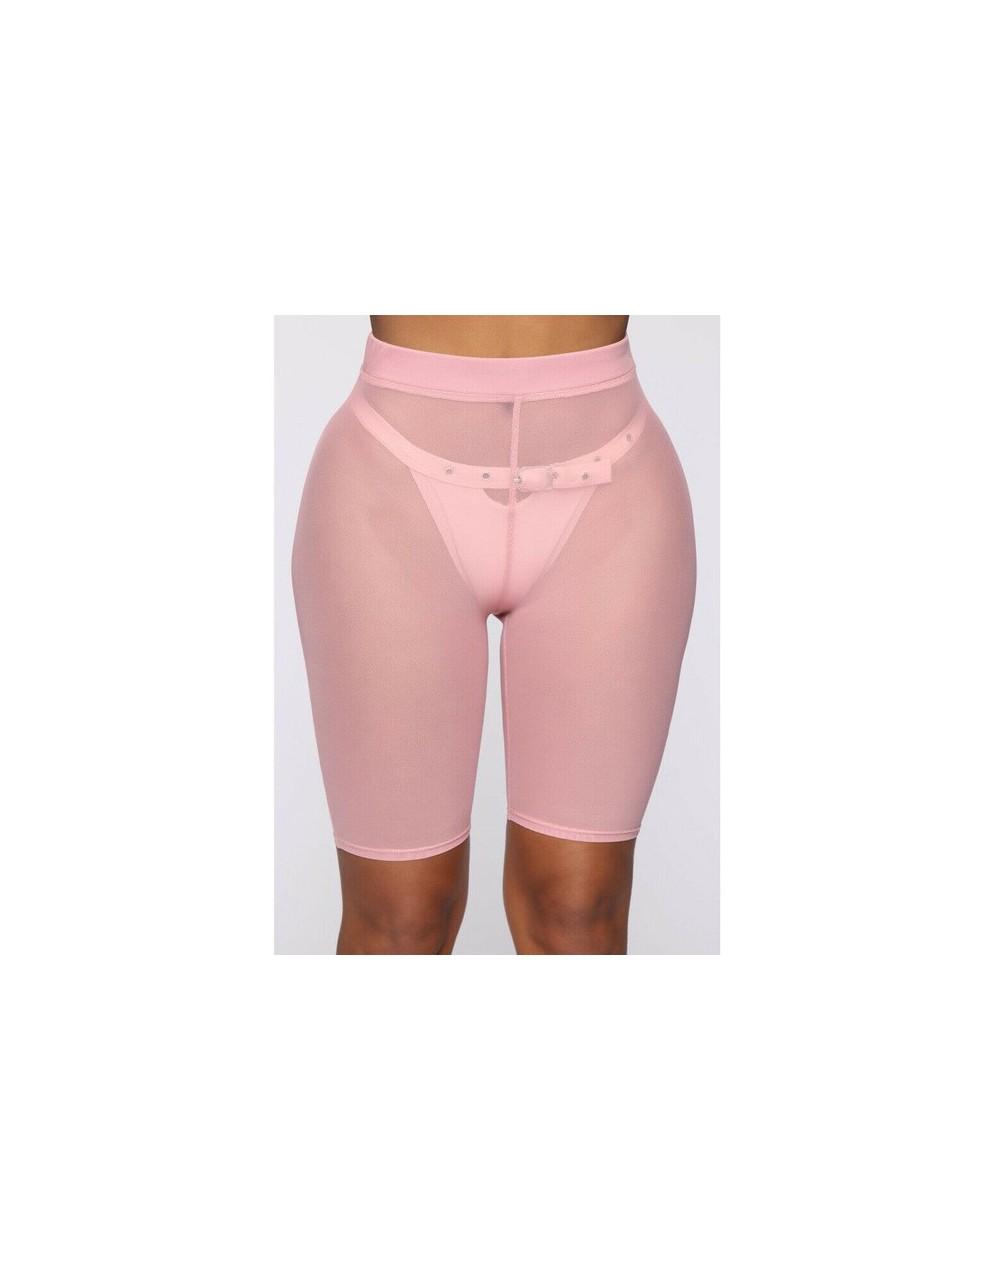 Mesh Shorts Women See-through Beach Swimwear Cover Ups New High Waist Pure Color Bikini Cover Ups Bathing Shorts - Pink no P...